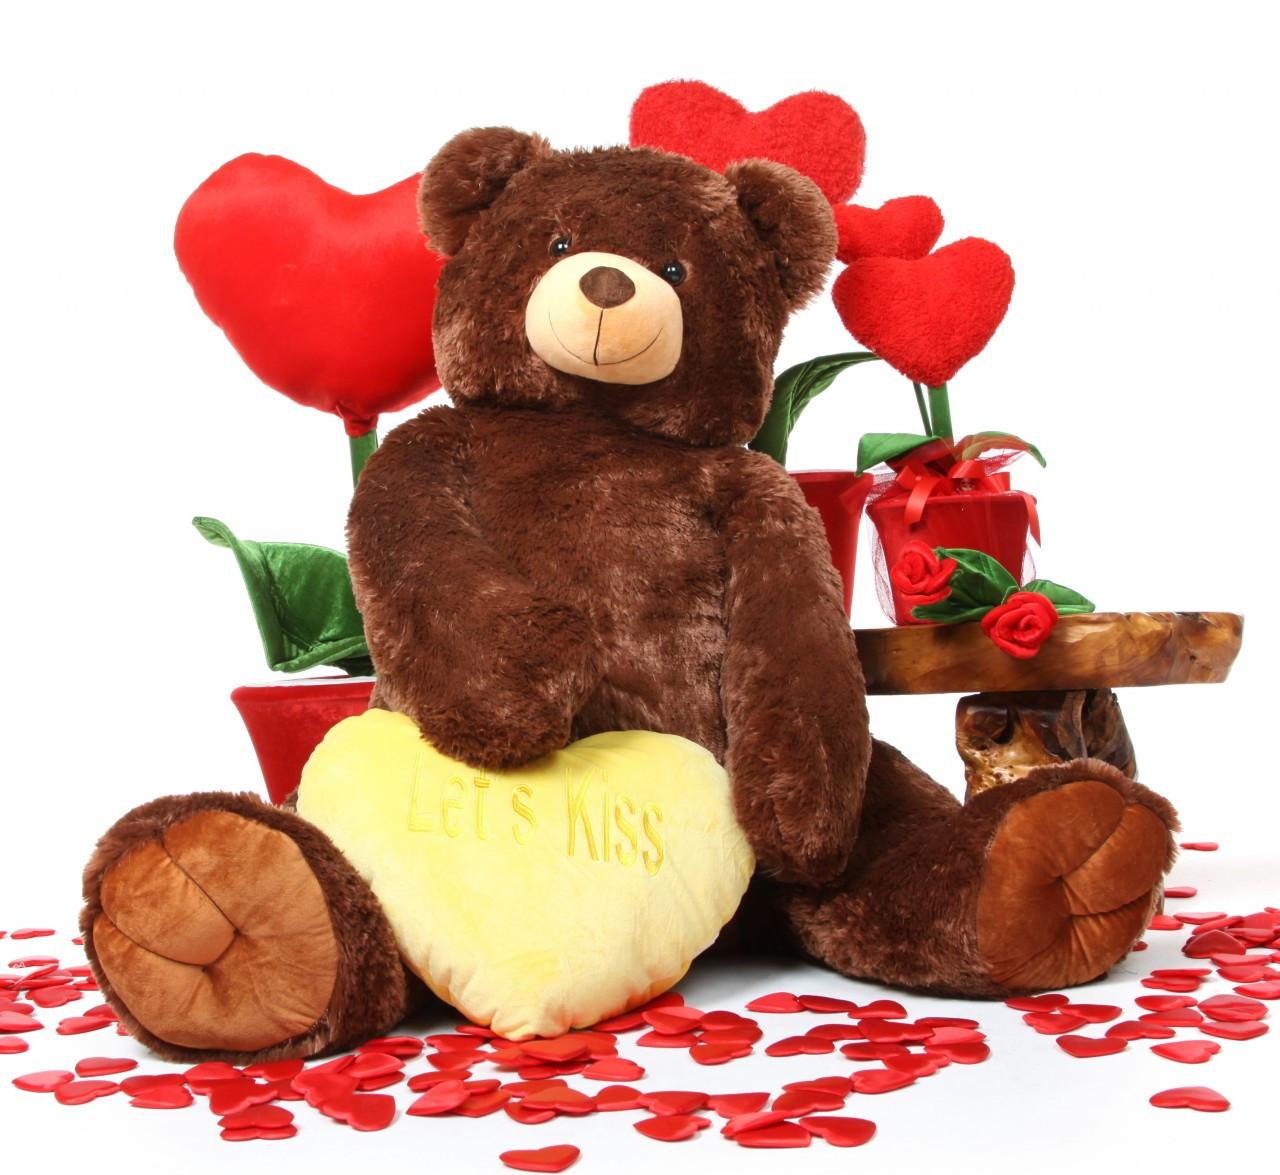 Jumbo Smooches Heart Tubs LETS KISS Yellow Heart Dark Caramel Teddy Bear 52in